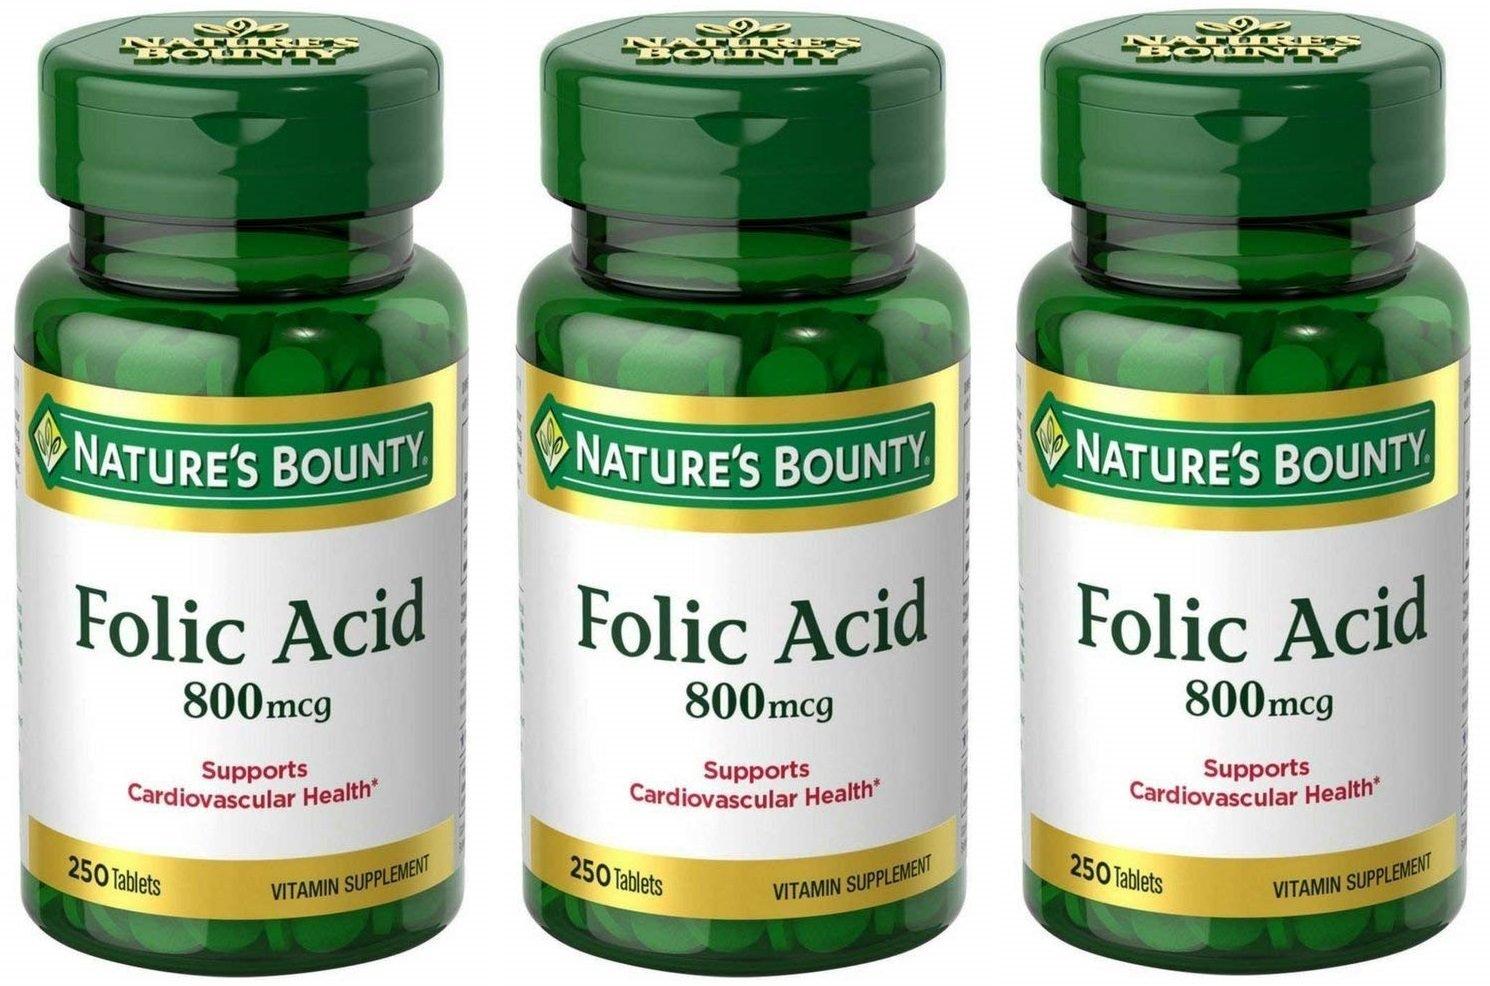 Folic Acid 800 mcg Tablets Maximum Strength, 3 Bottles (250 Count) by Nature's Bounty (Image #1)